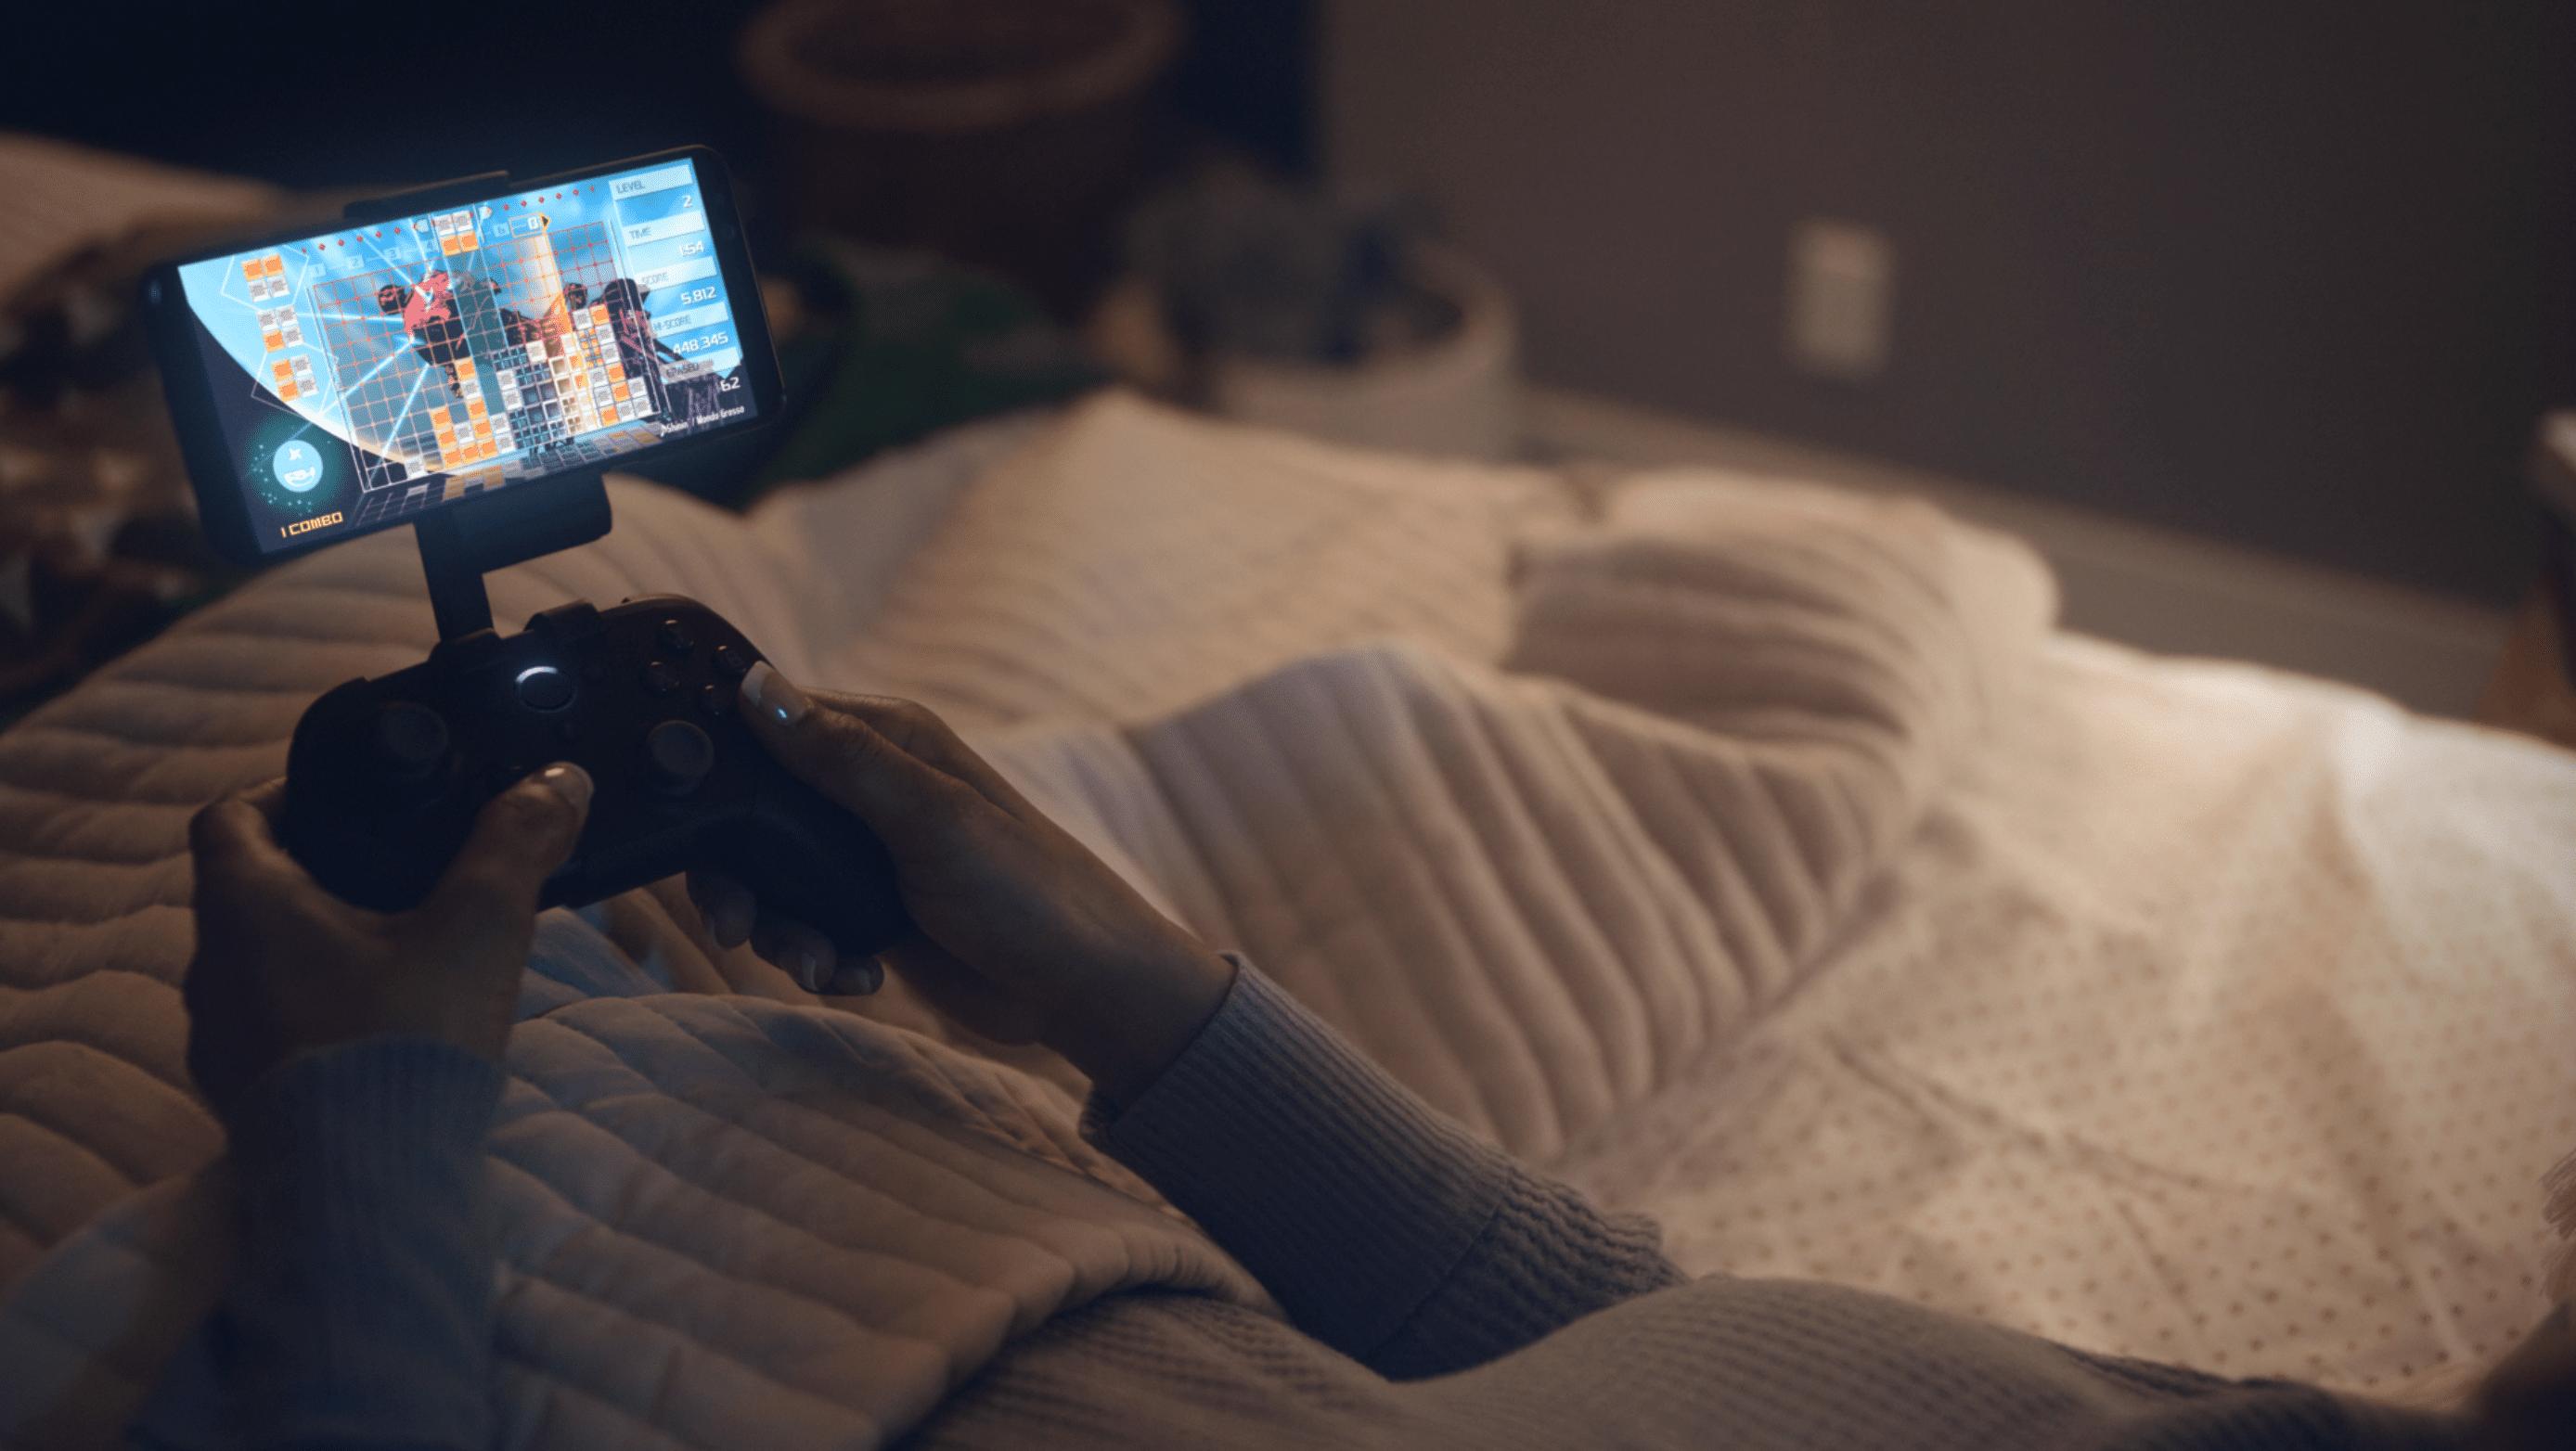 Playing Amazon Luna on a phone.